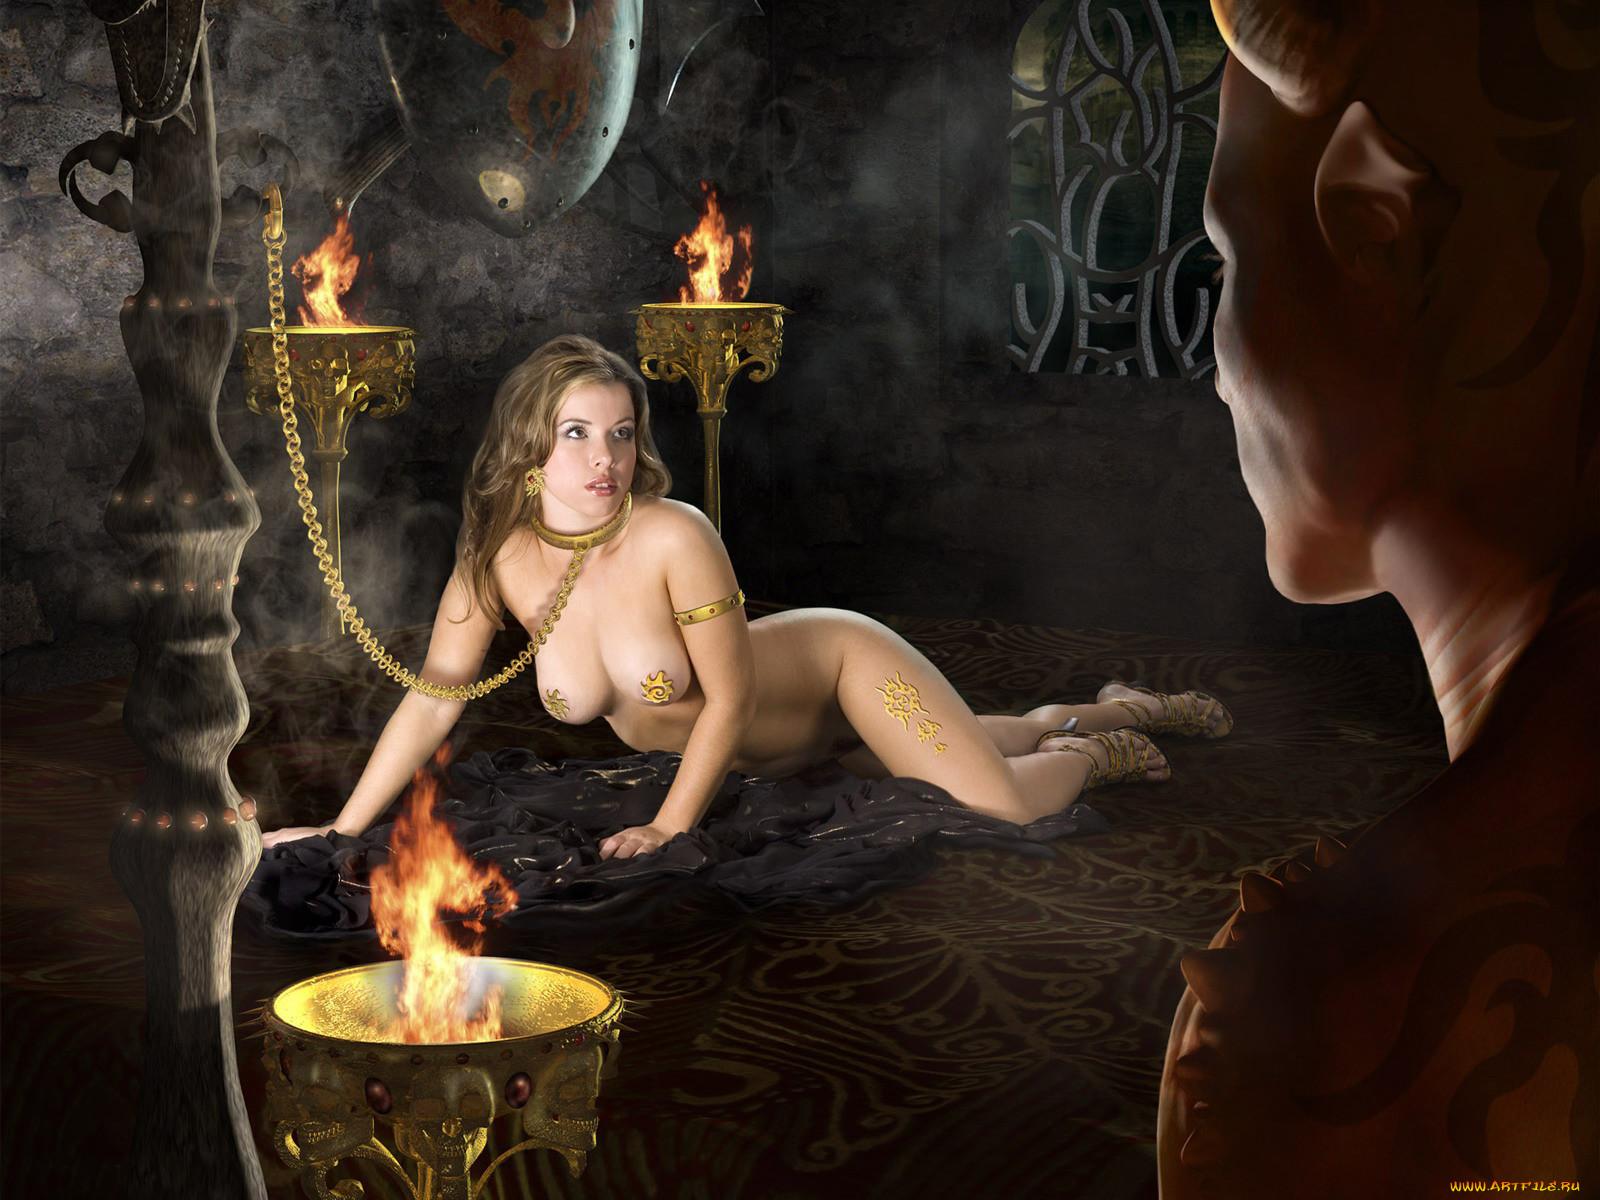 Wallpapers sex slave fantasy smut movie